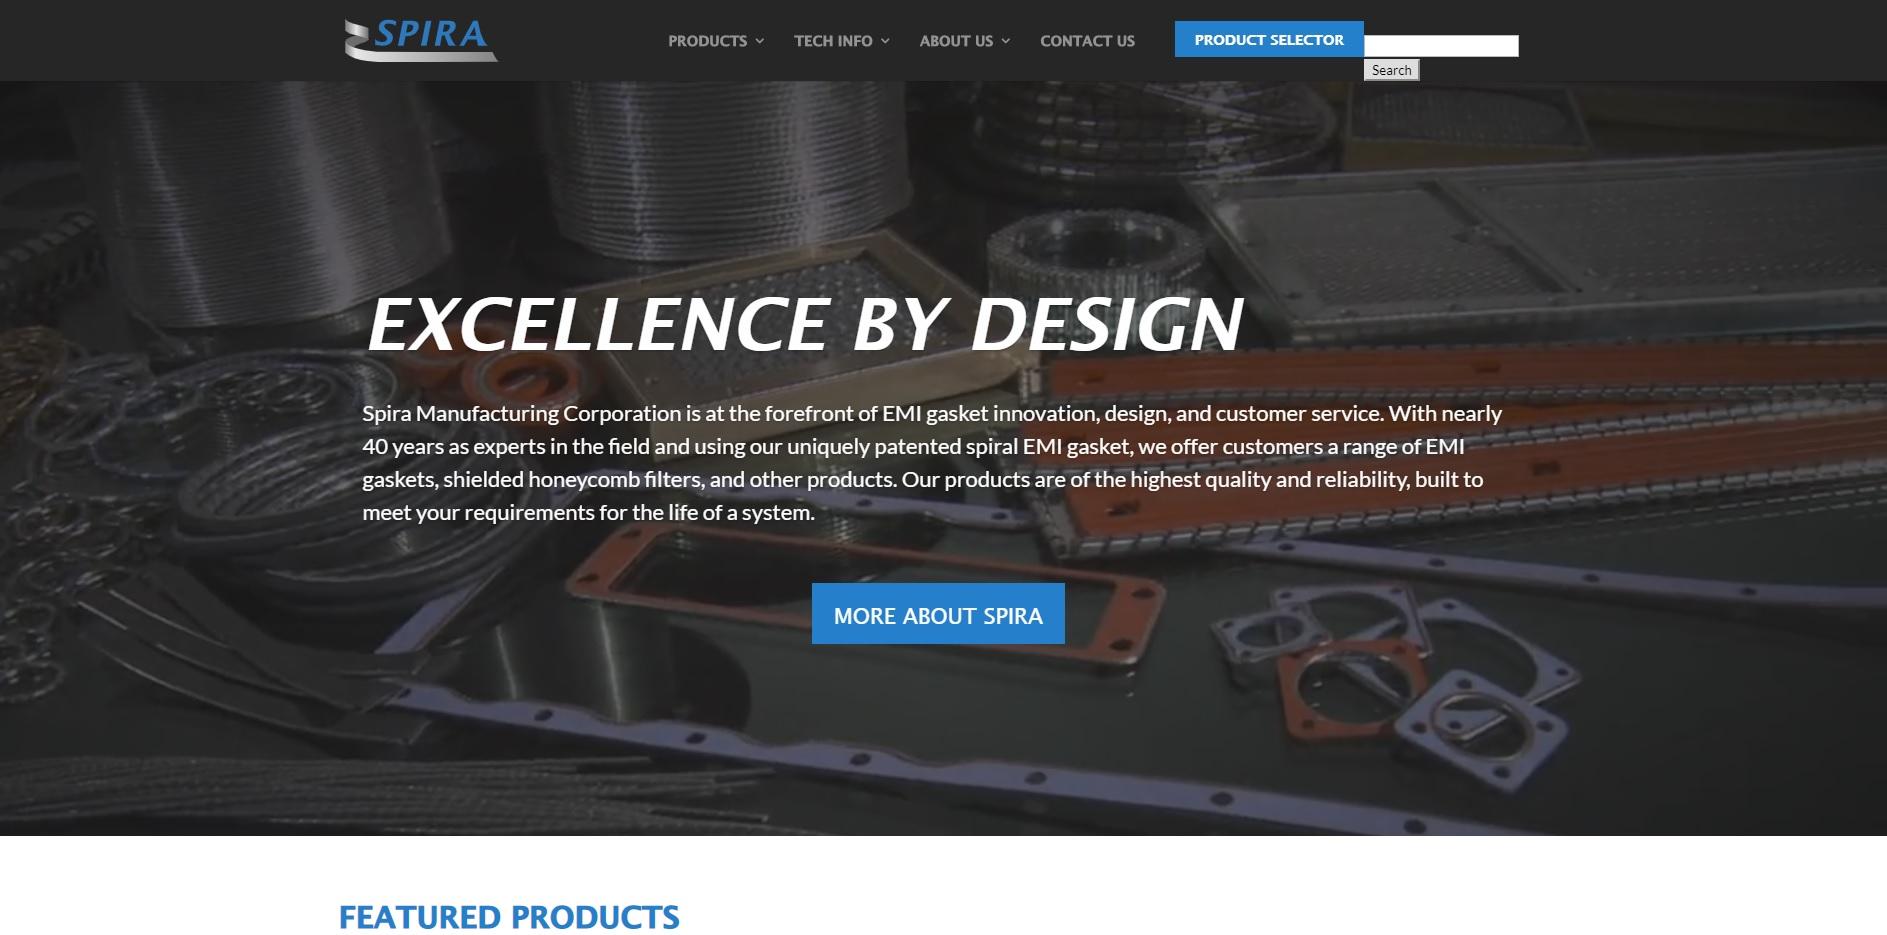 Spira Manufacturing Corporation